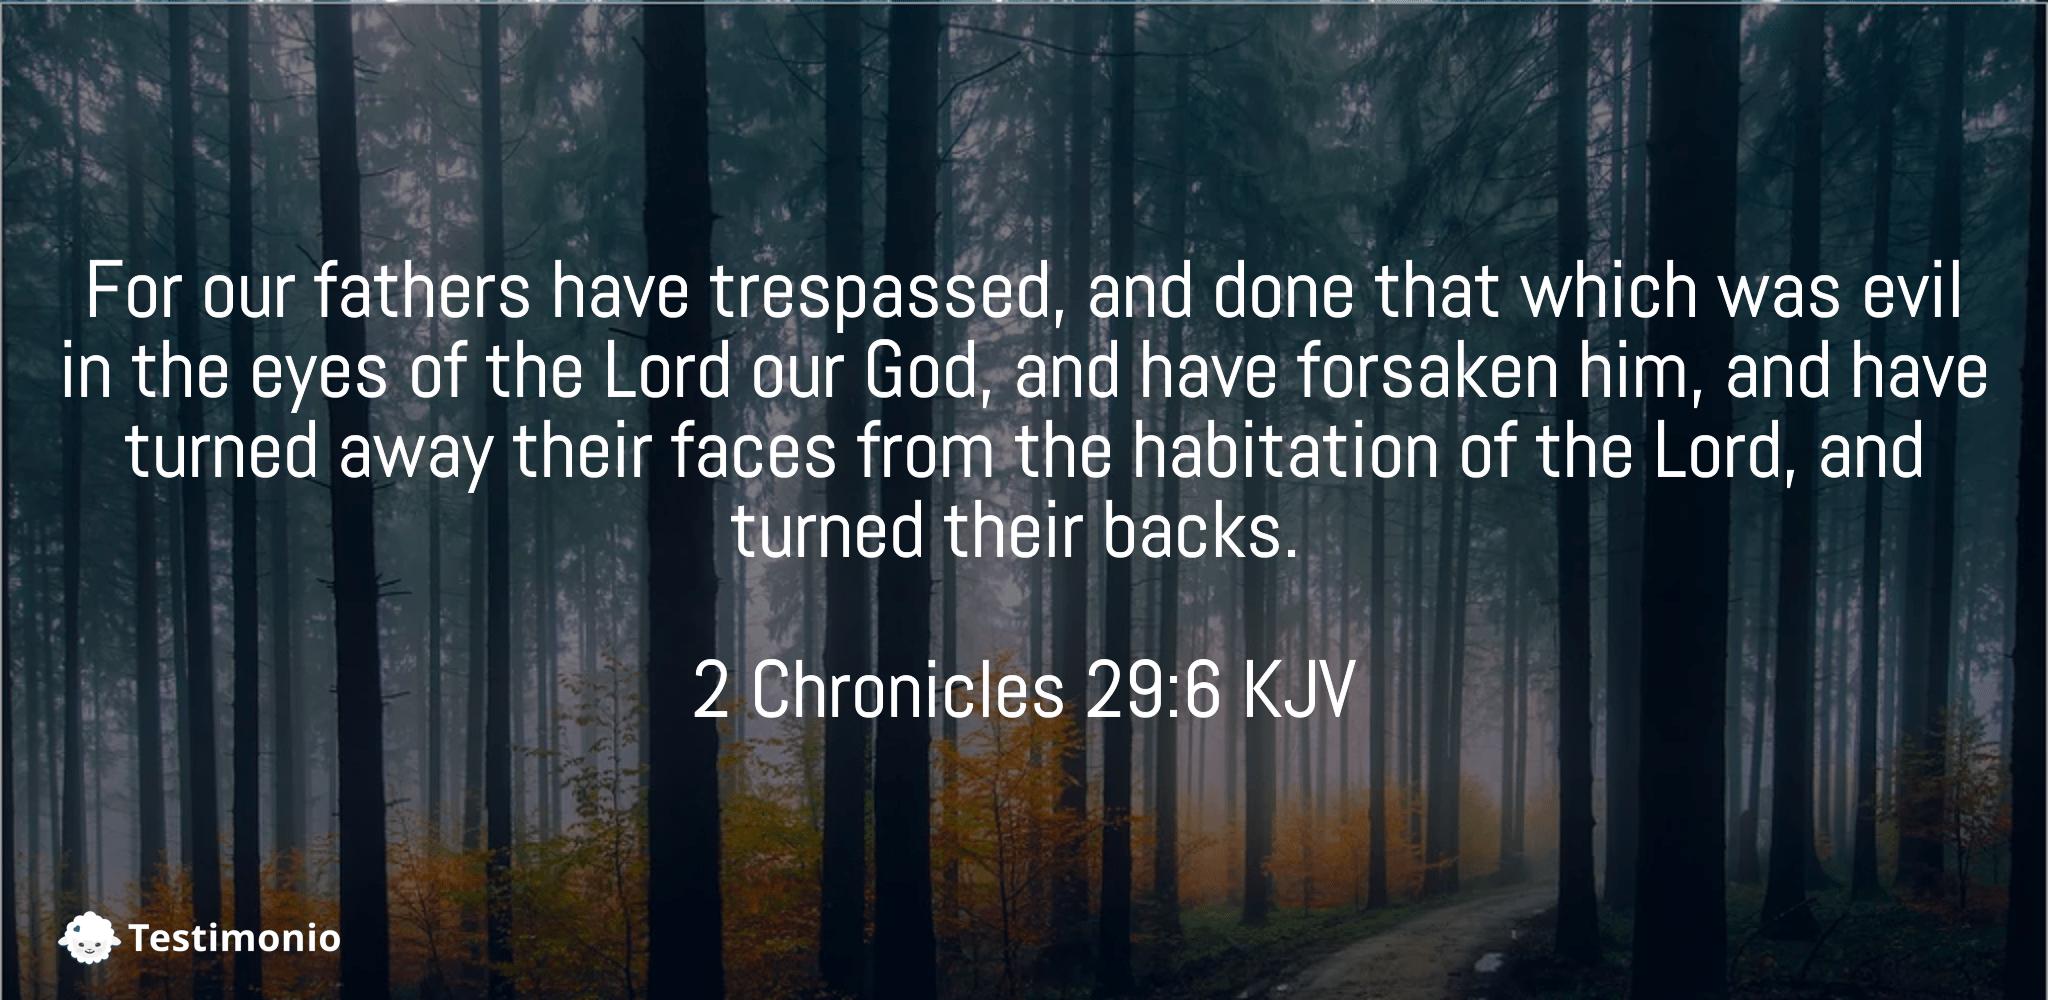 2 Chronicles 29:6